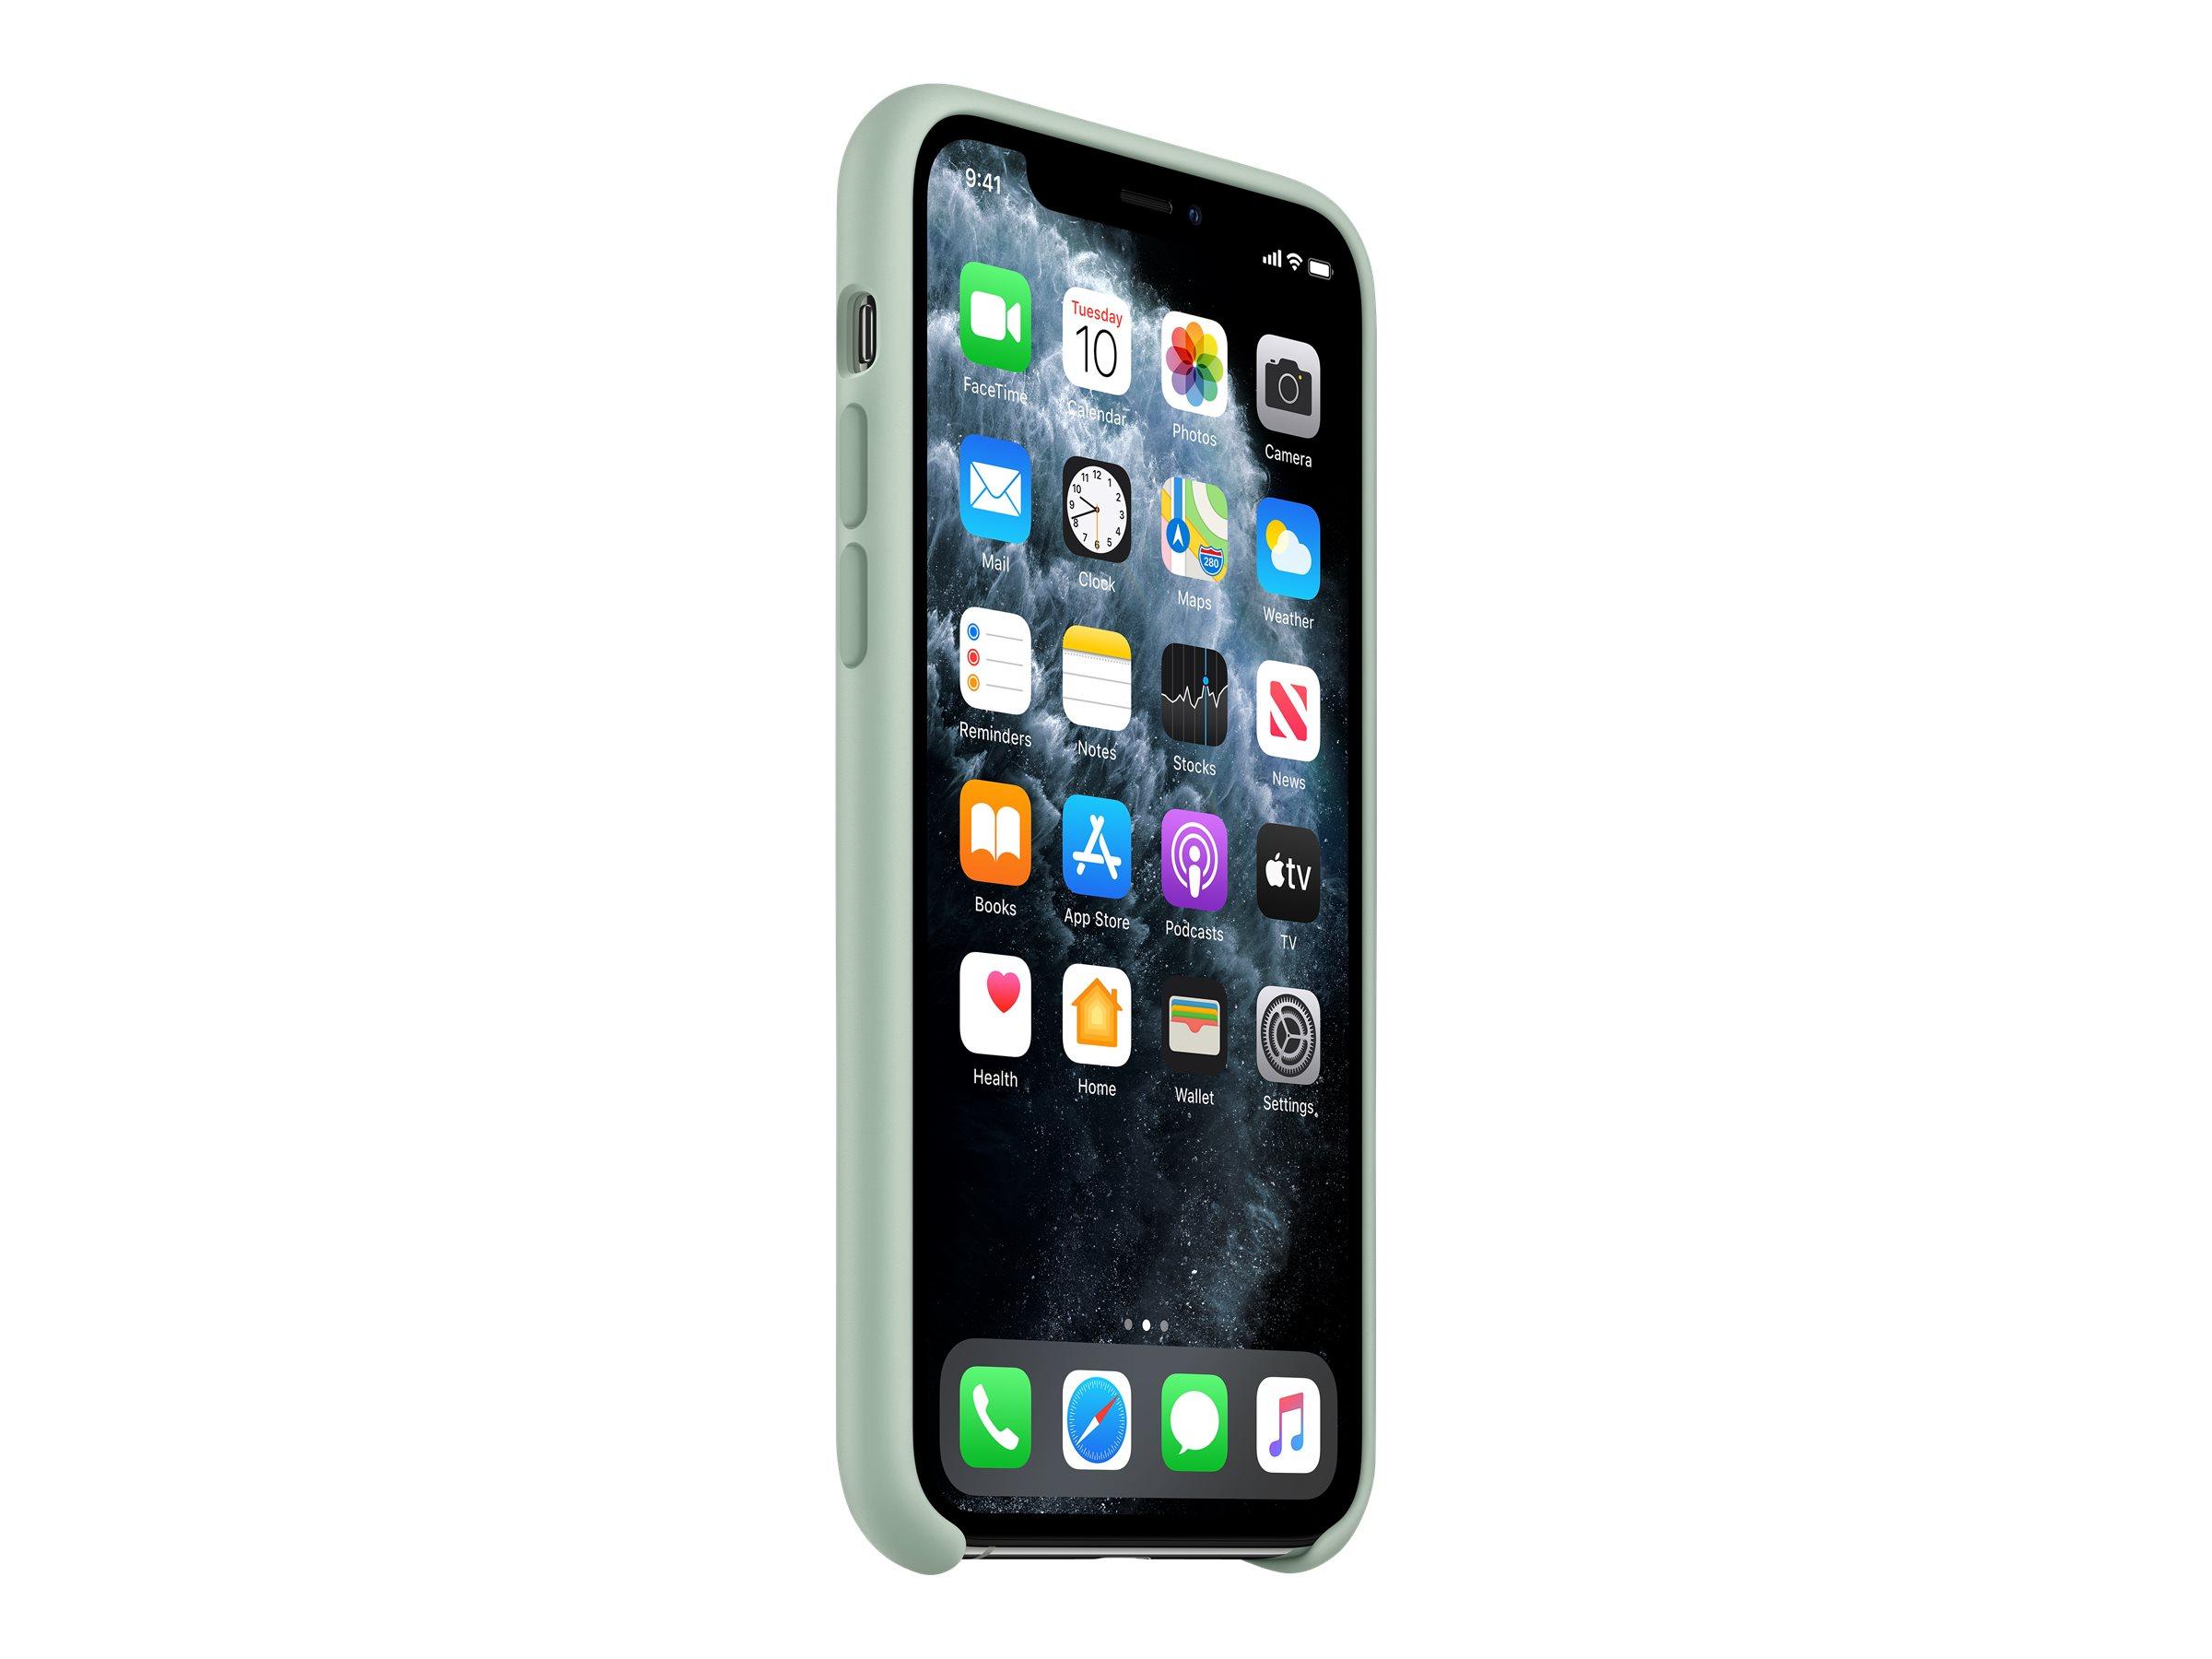 Hintere abdeckung fuer mobiltelefon silikon beryl fuer iphone 11 pro 12026122 mxm72zm a